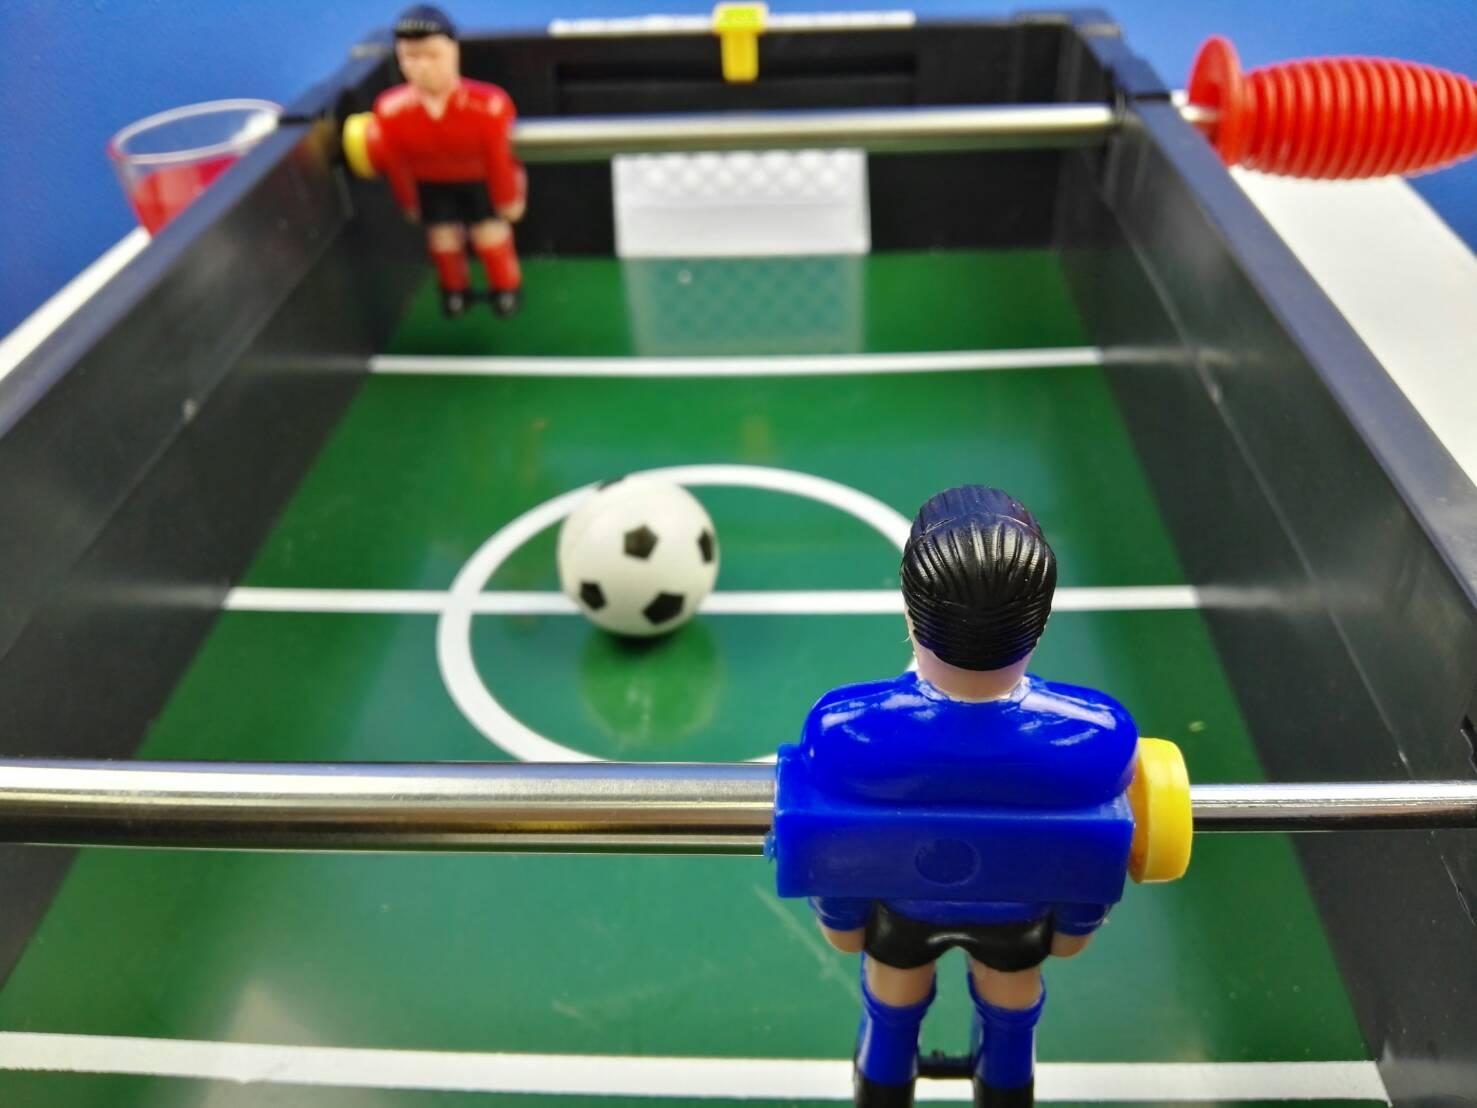 Soccer Tabel Drinking shot